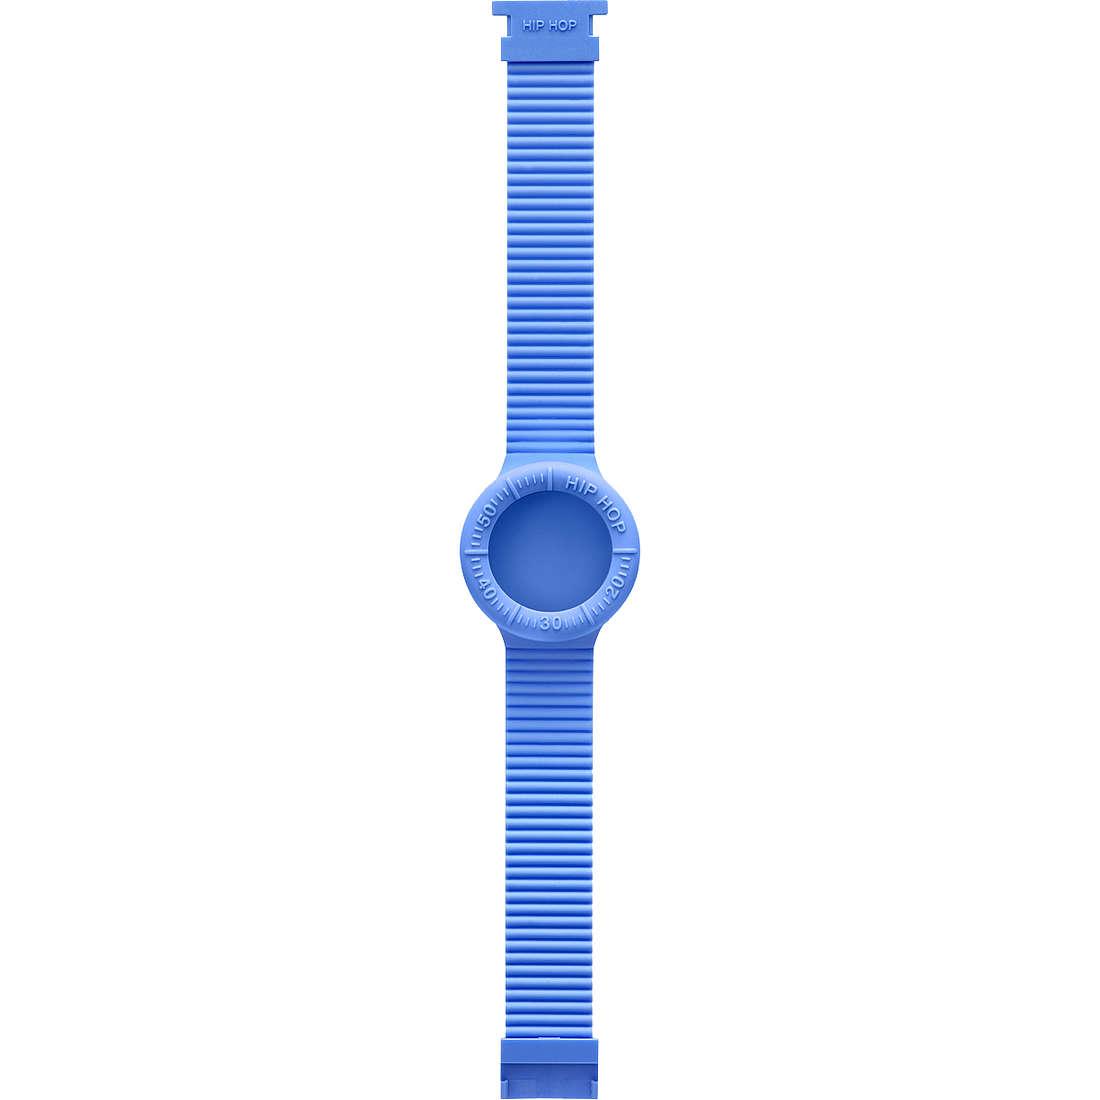 orologio accessorio unisex Hip Hop Hero HBU0123